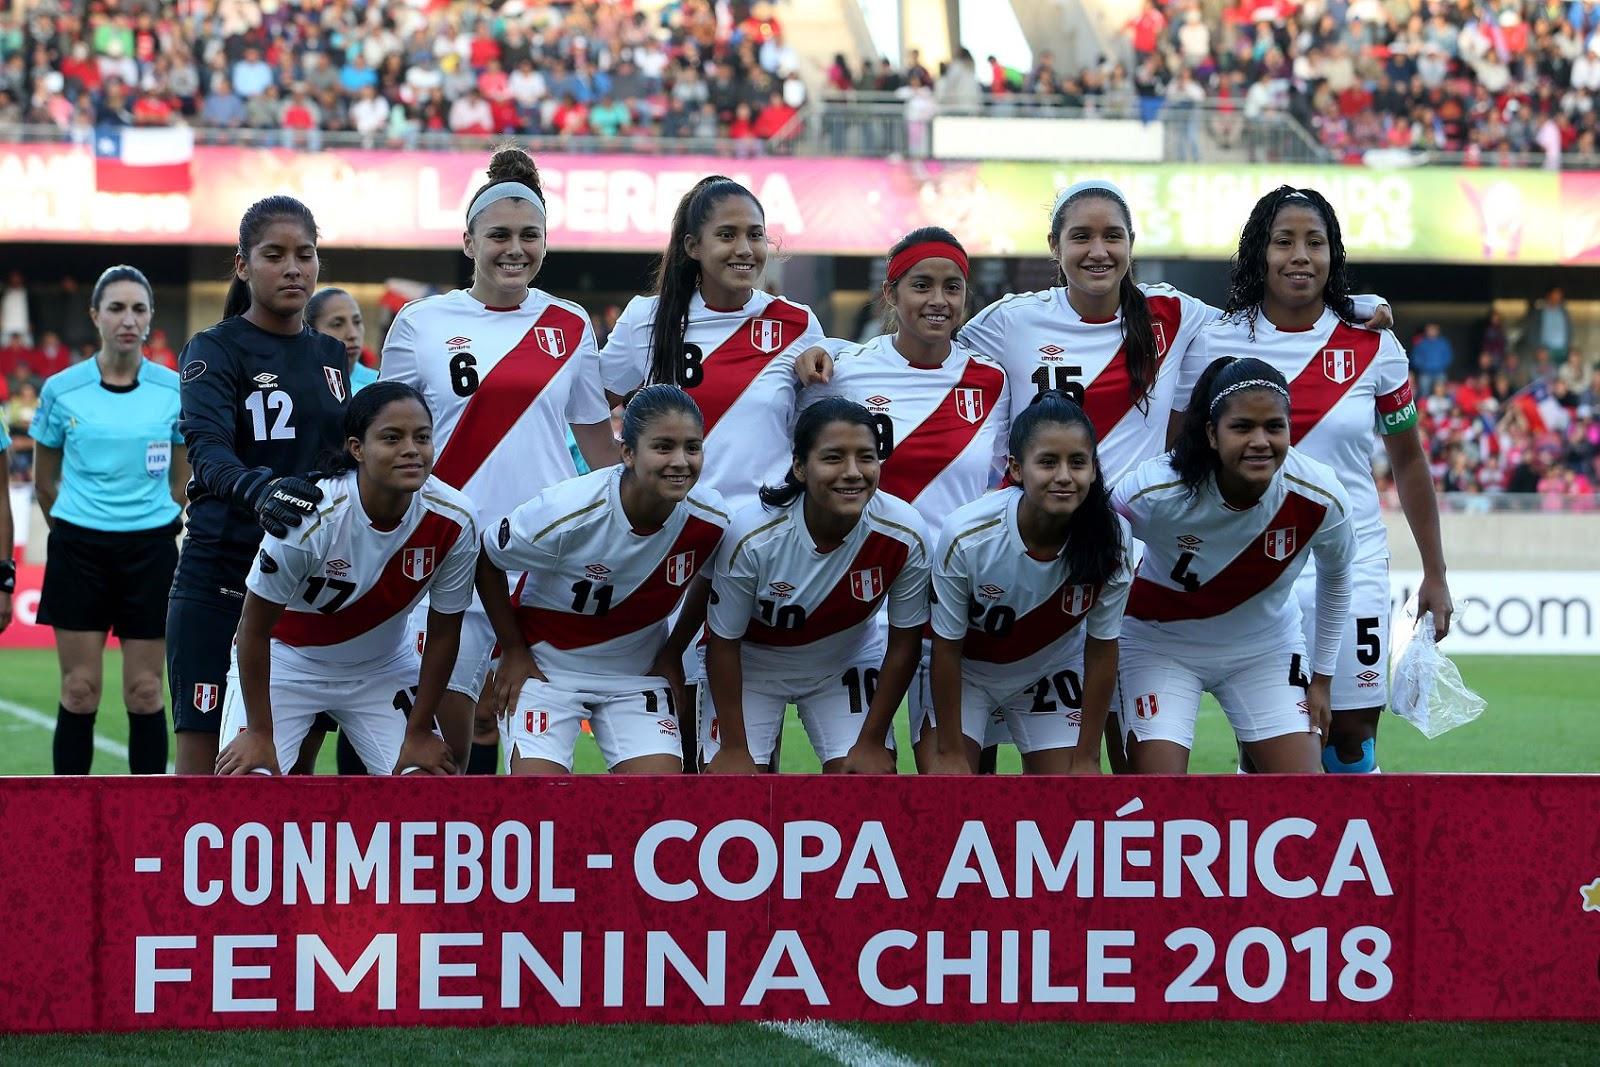 Formación de selección de Perú ante Chile, Copa América Femenina 2018, 12 de abril